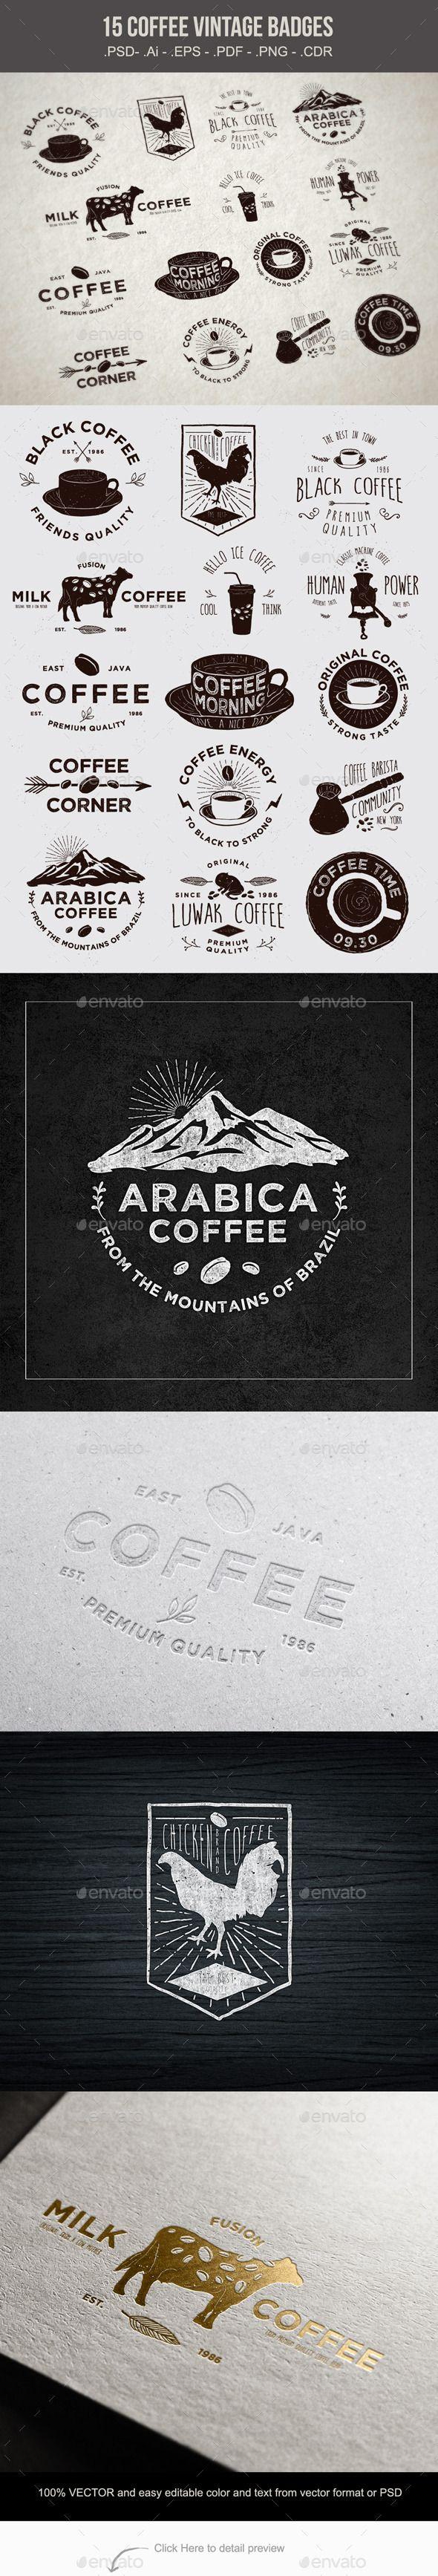 15 Coffee Vintage Badges Vector Template #design Download…